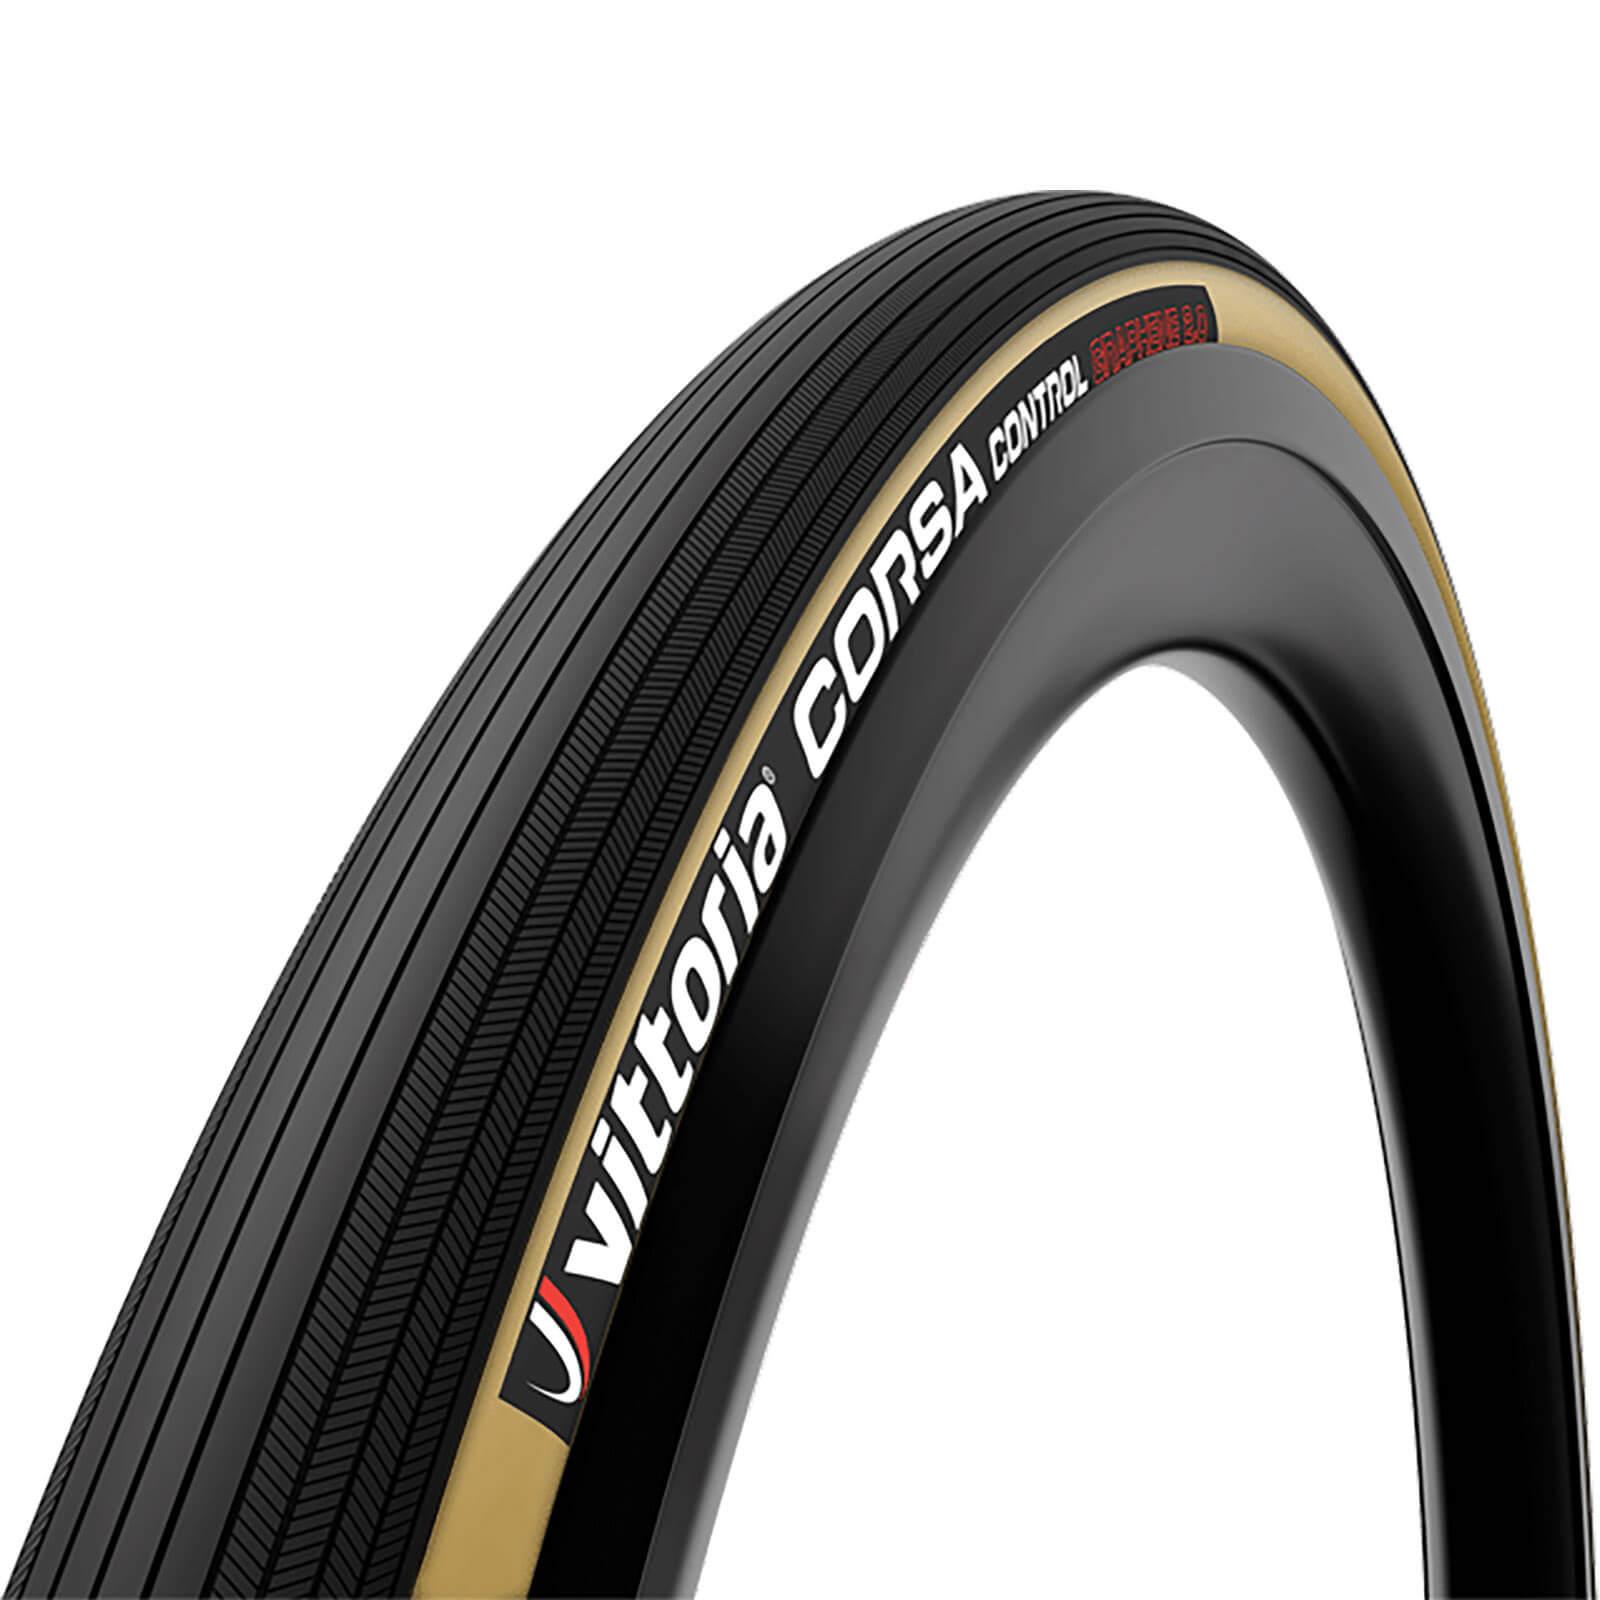 Vittoria Corsa Control G2.0 Road Tire - 700x28mm - Para/Black